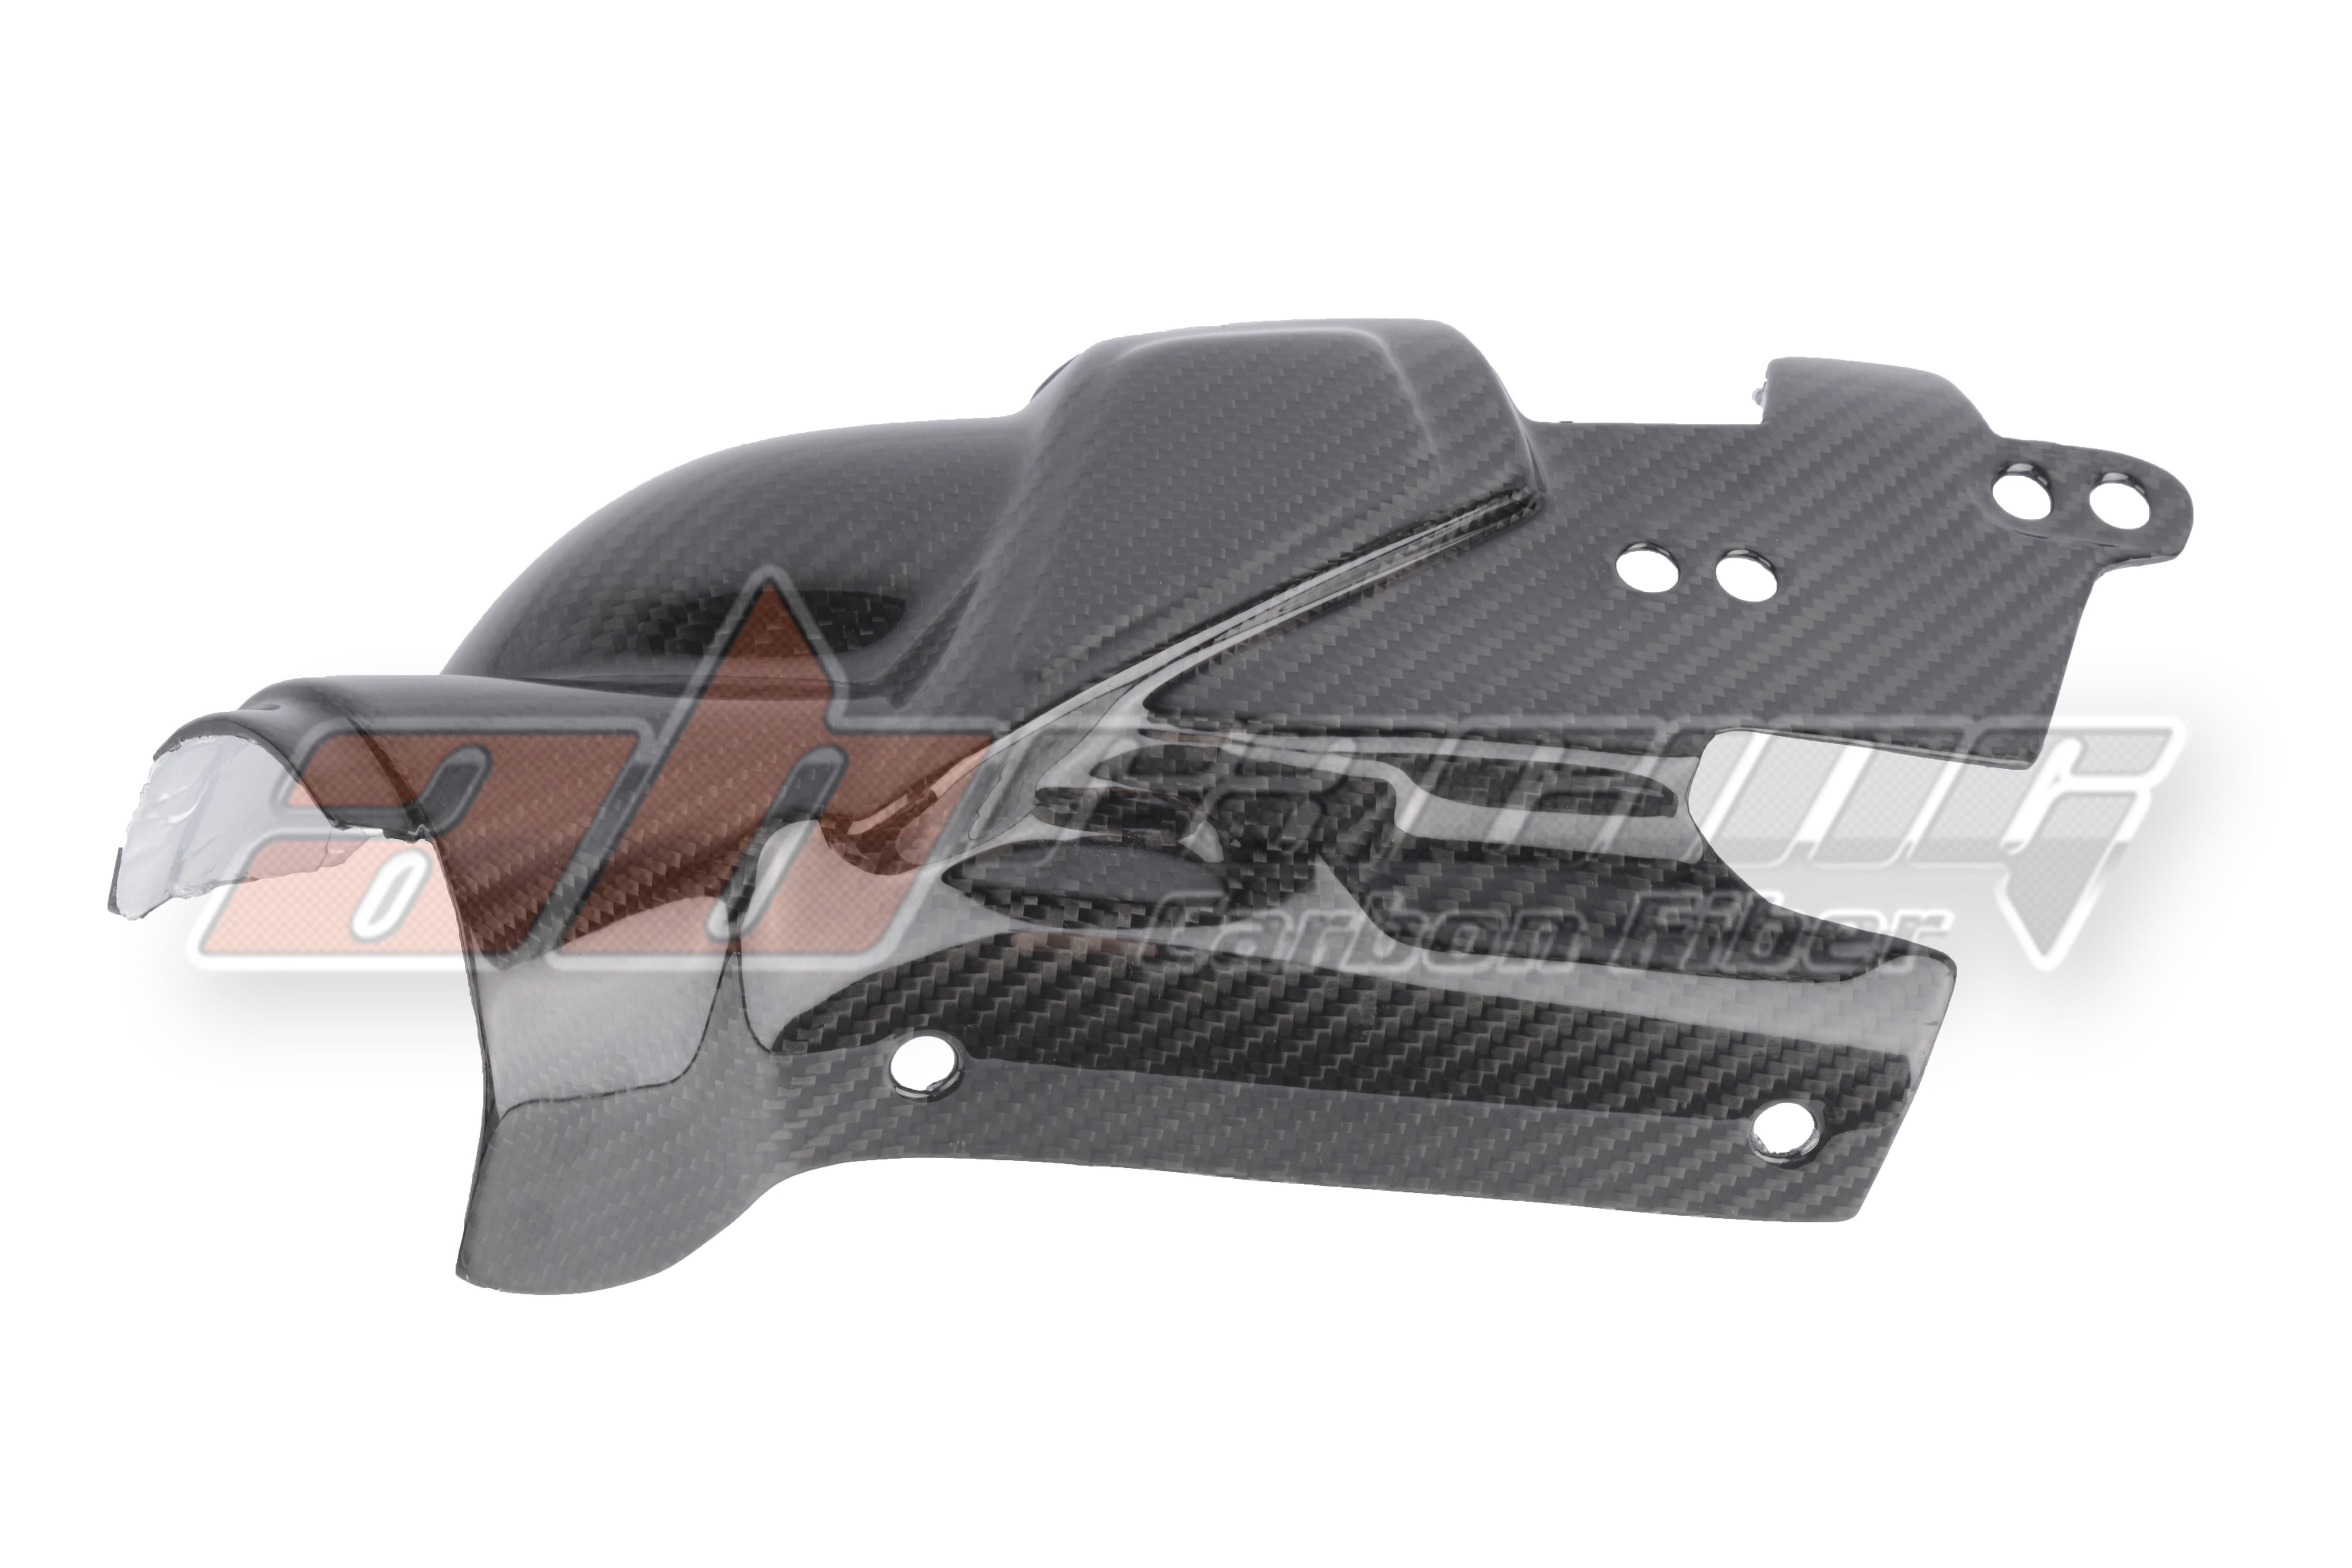 Brake Rearset Exhaust Heat Shield Guard Fairing  For Yamaha R1 2009 - 2014  Full Carbon Fiber 100%